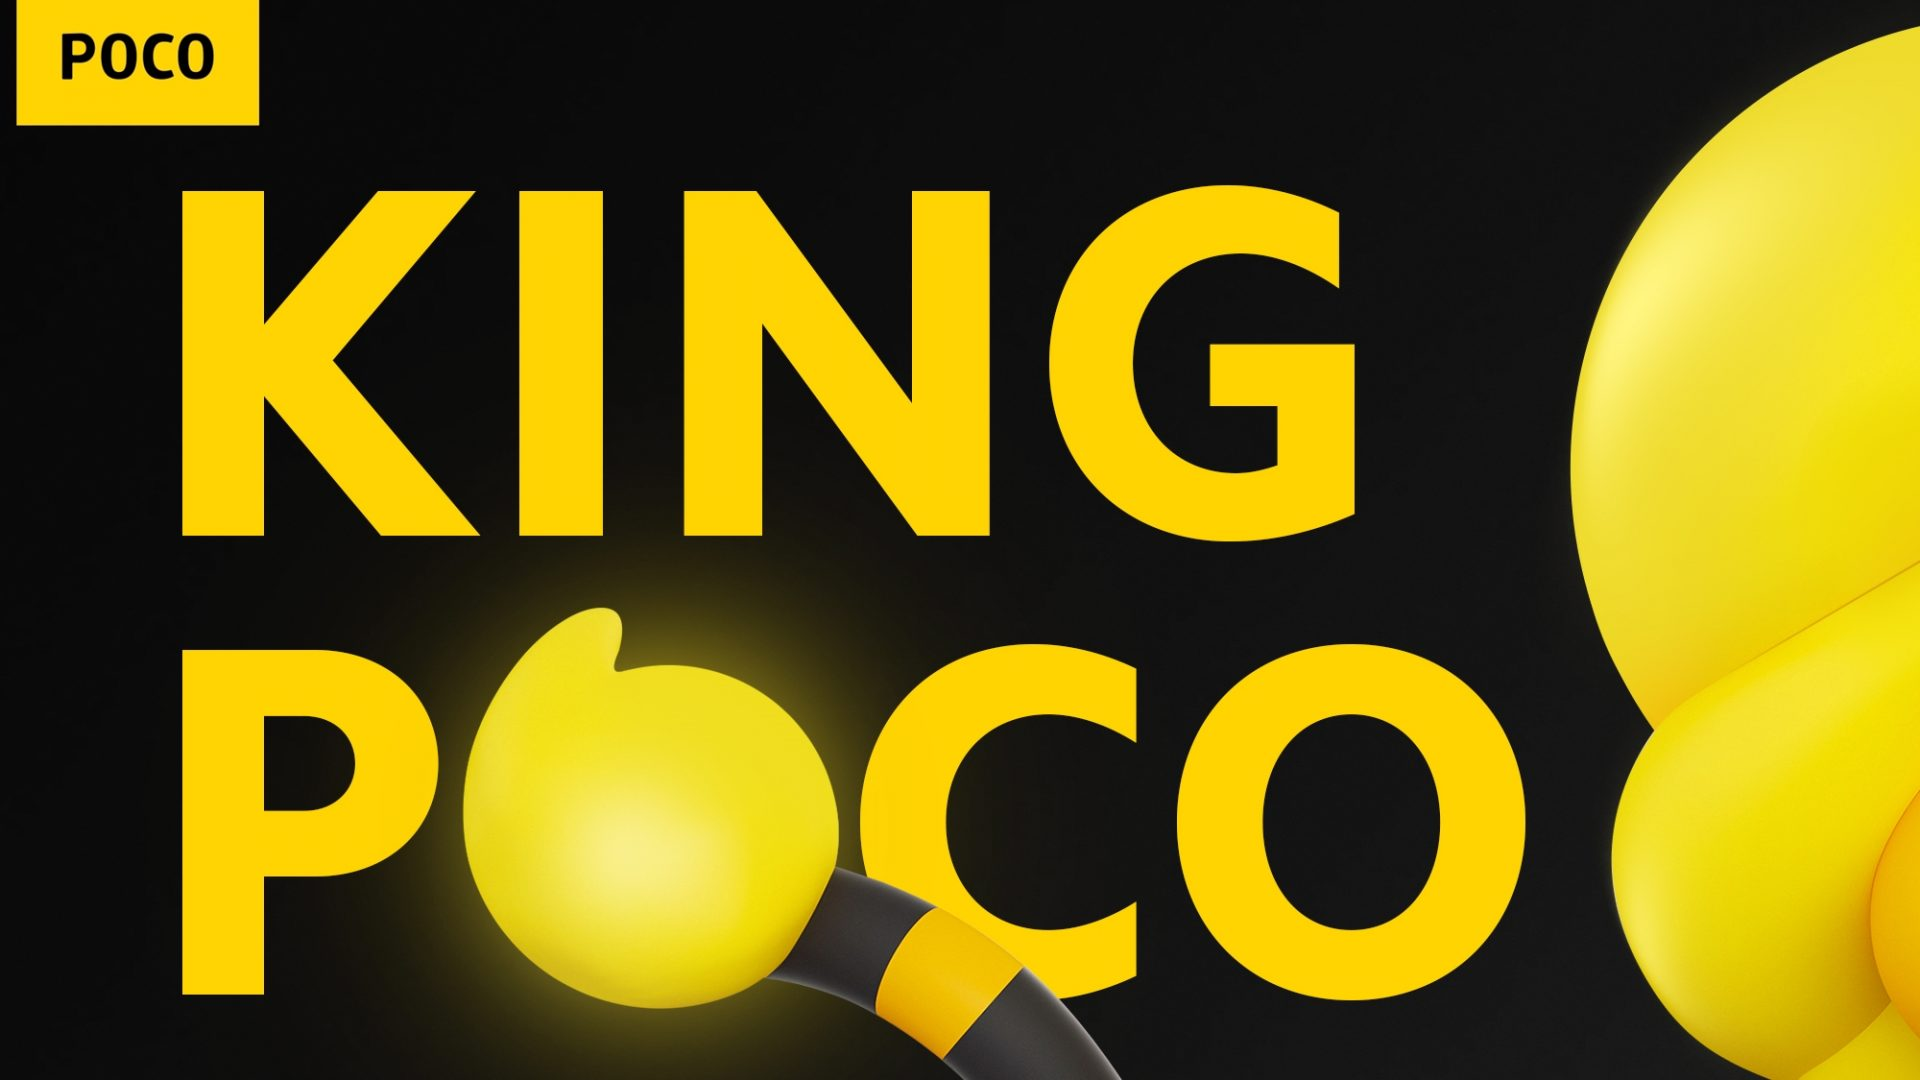 harga POCO X3 Pro berapa